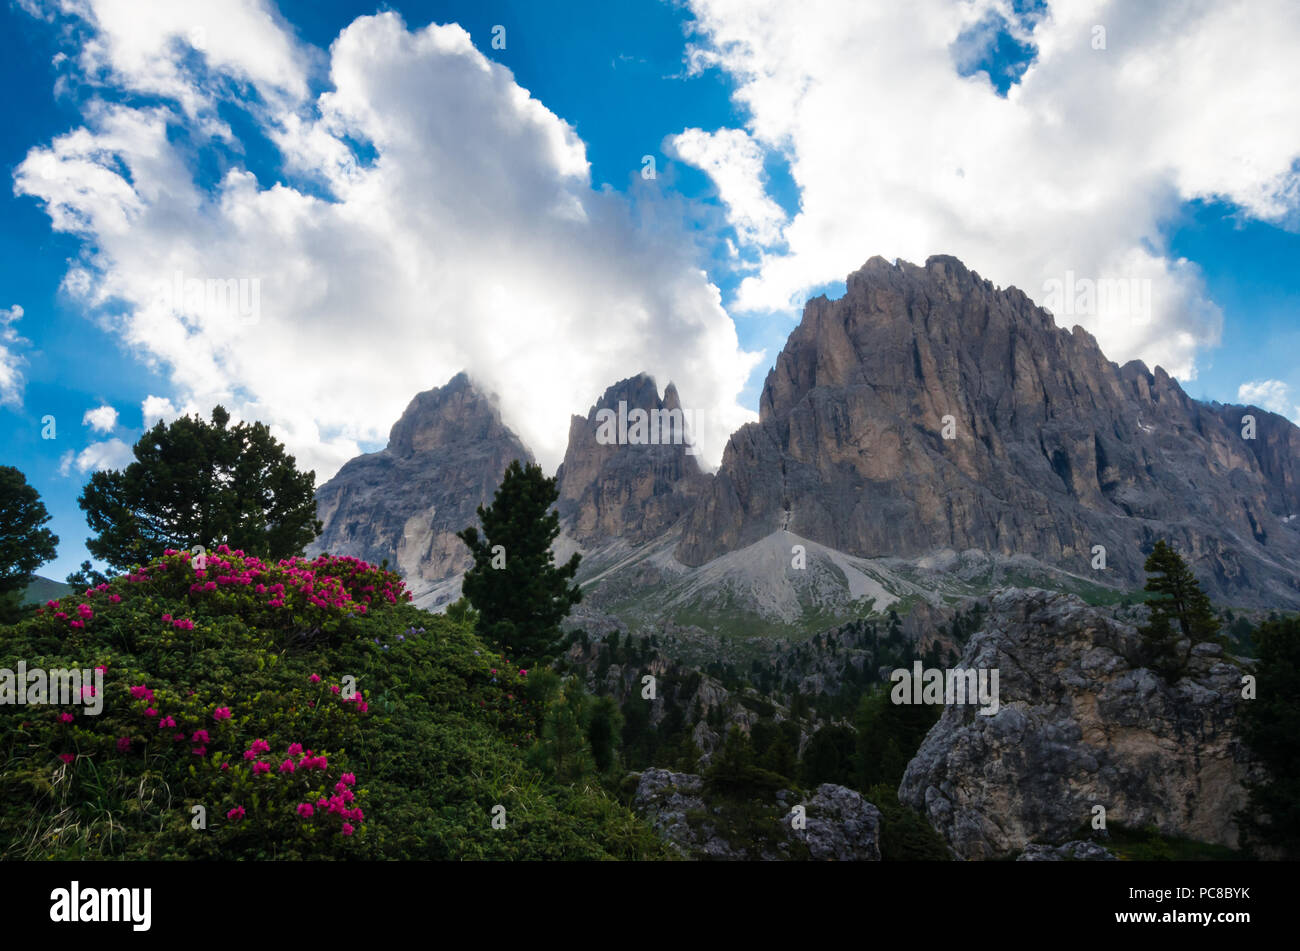 Sassolungo and Sassopiatto mountains, Italy. Photo from a hiking path in Dolomites, Dolomiti, Sella Alto Adige, South Tyrol - Stock Image